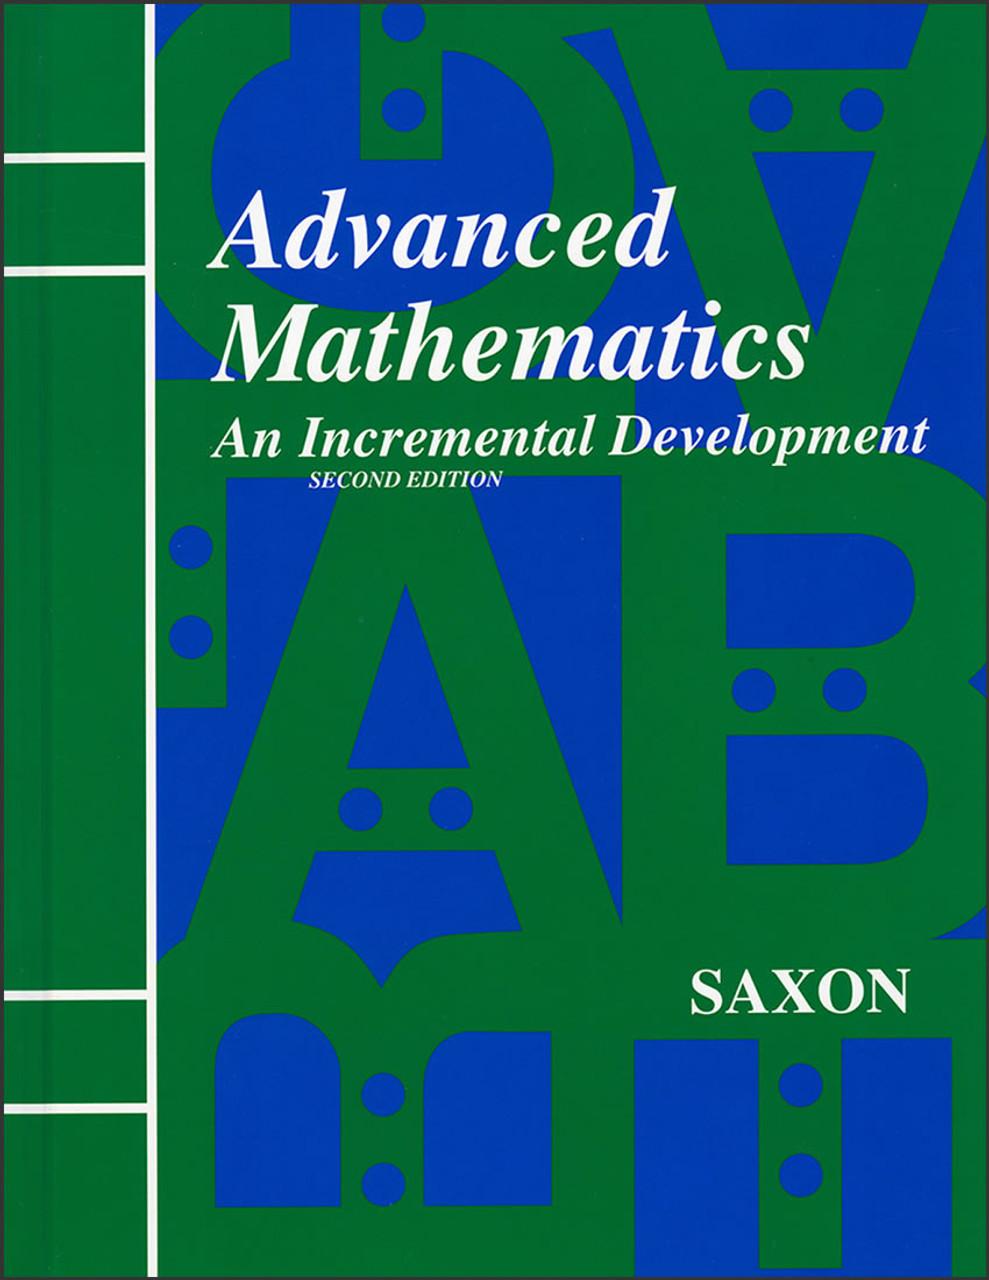 Saxon Advanced Mathematics - Home Study Kit